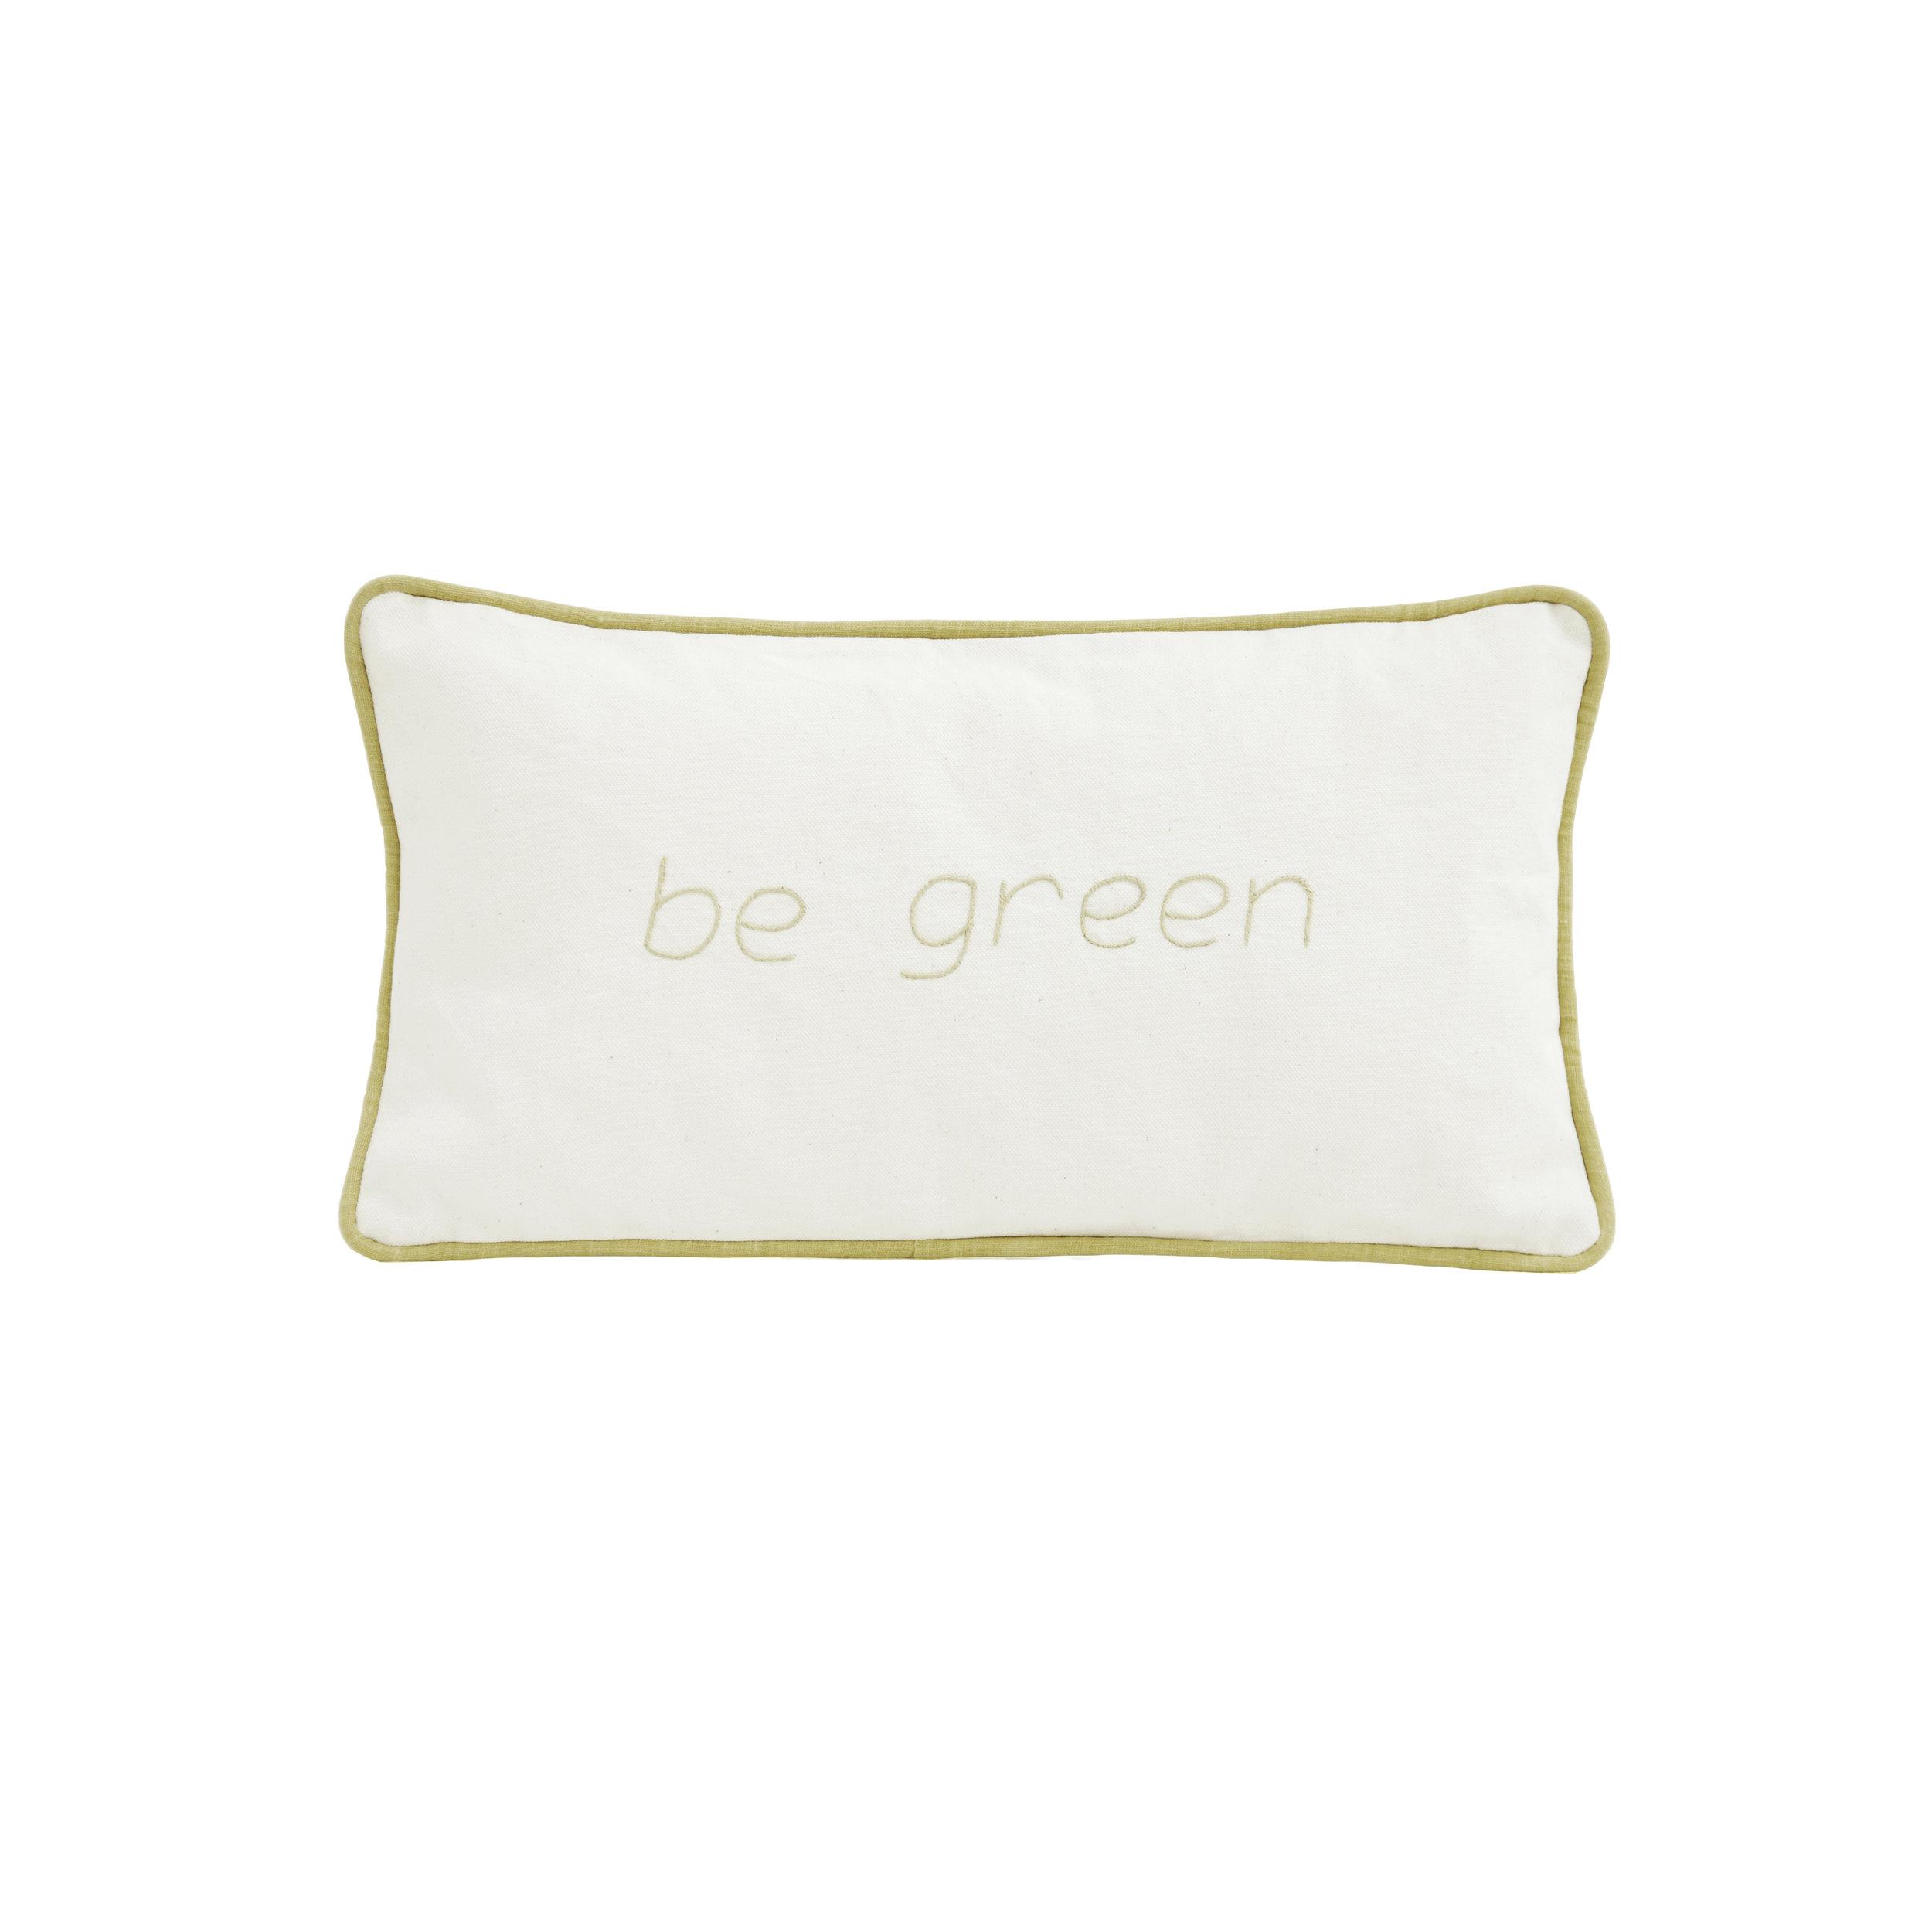 KH_Cushion_Be-Green_01.jpg